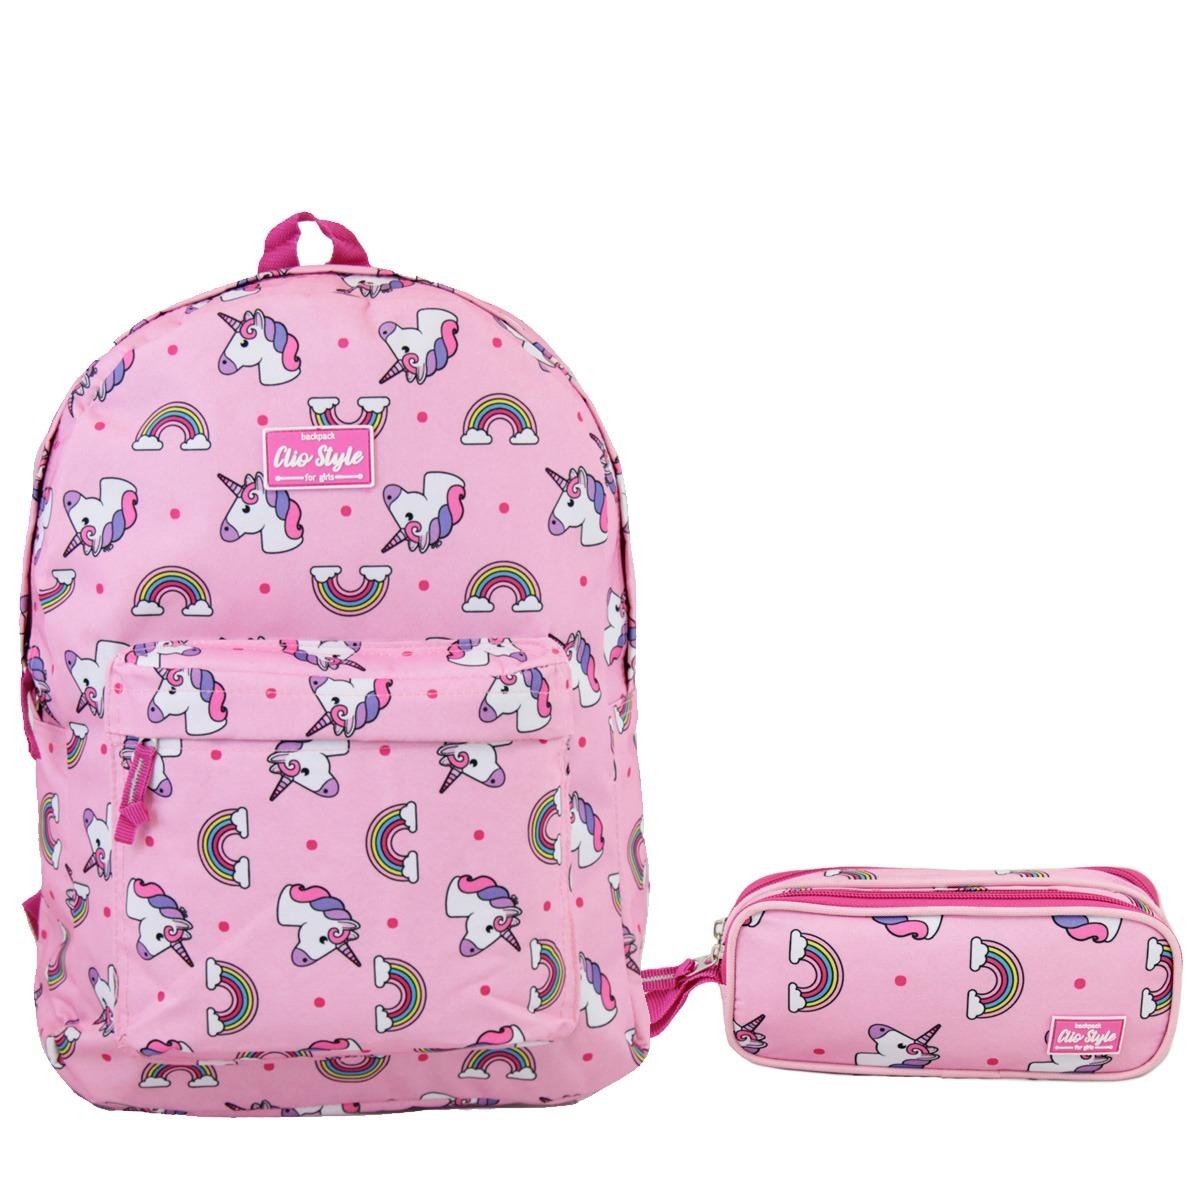 a11f9d101 kit escolar juvenil impermeável unicórnio mochila estojo. Carregando zoom.